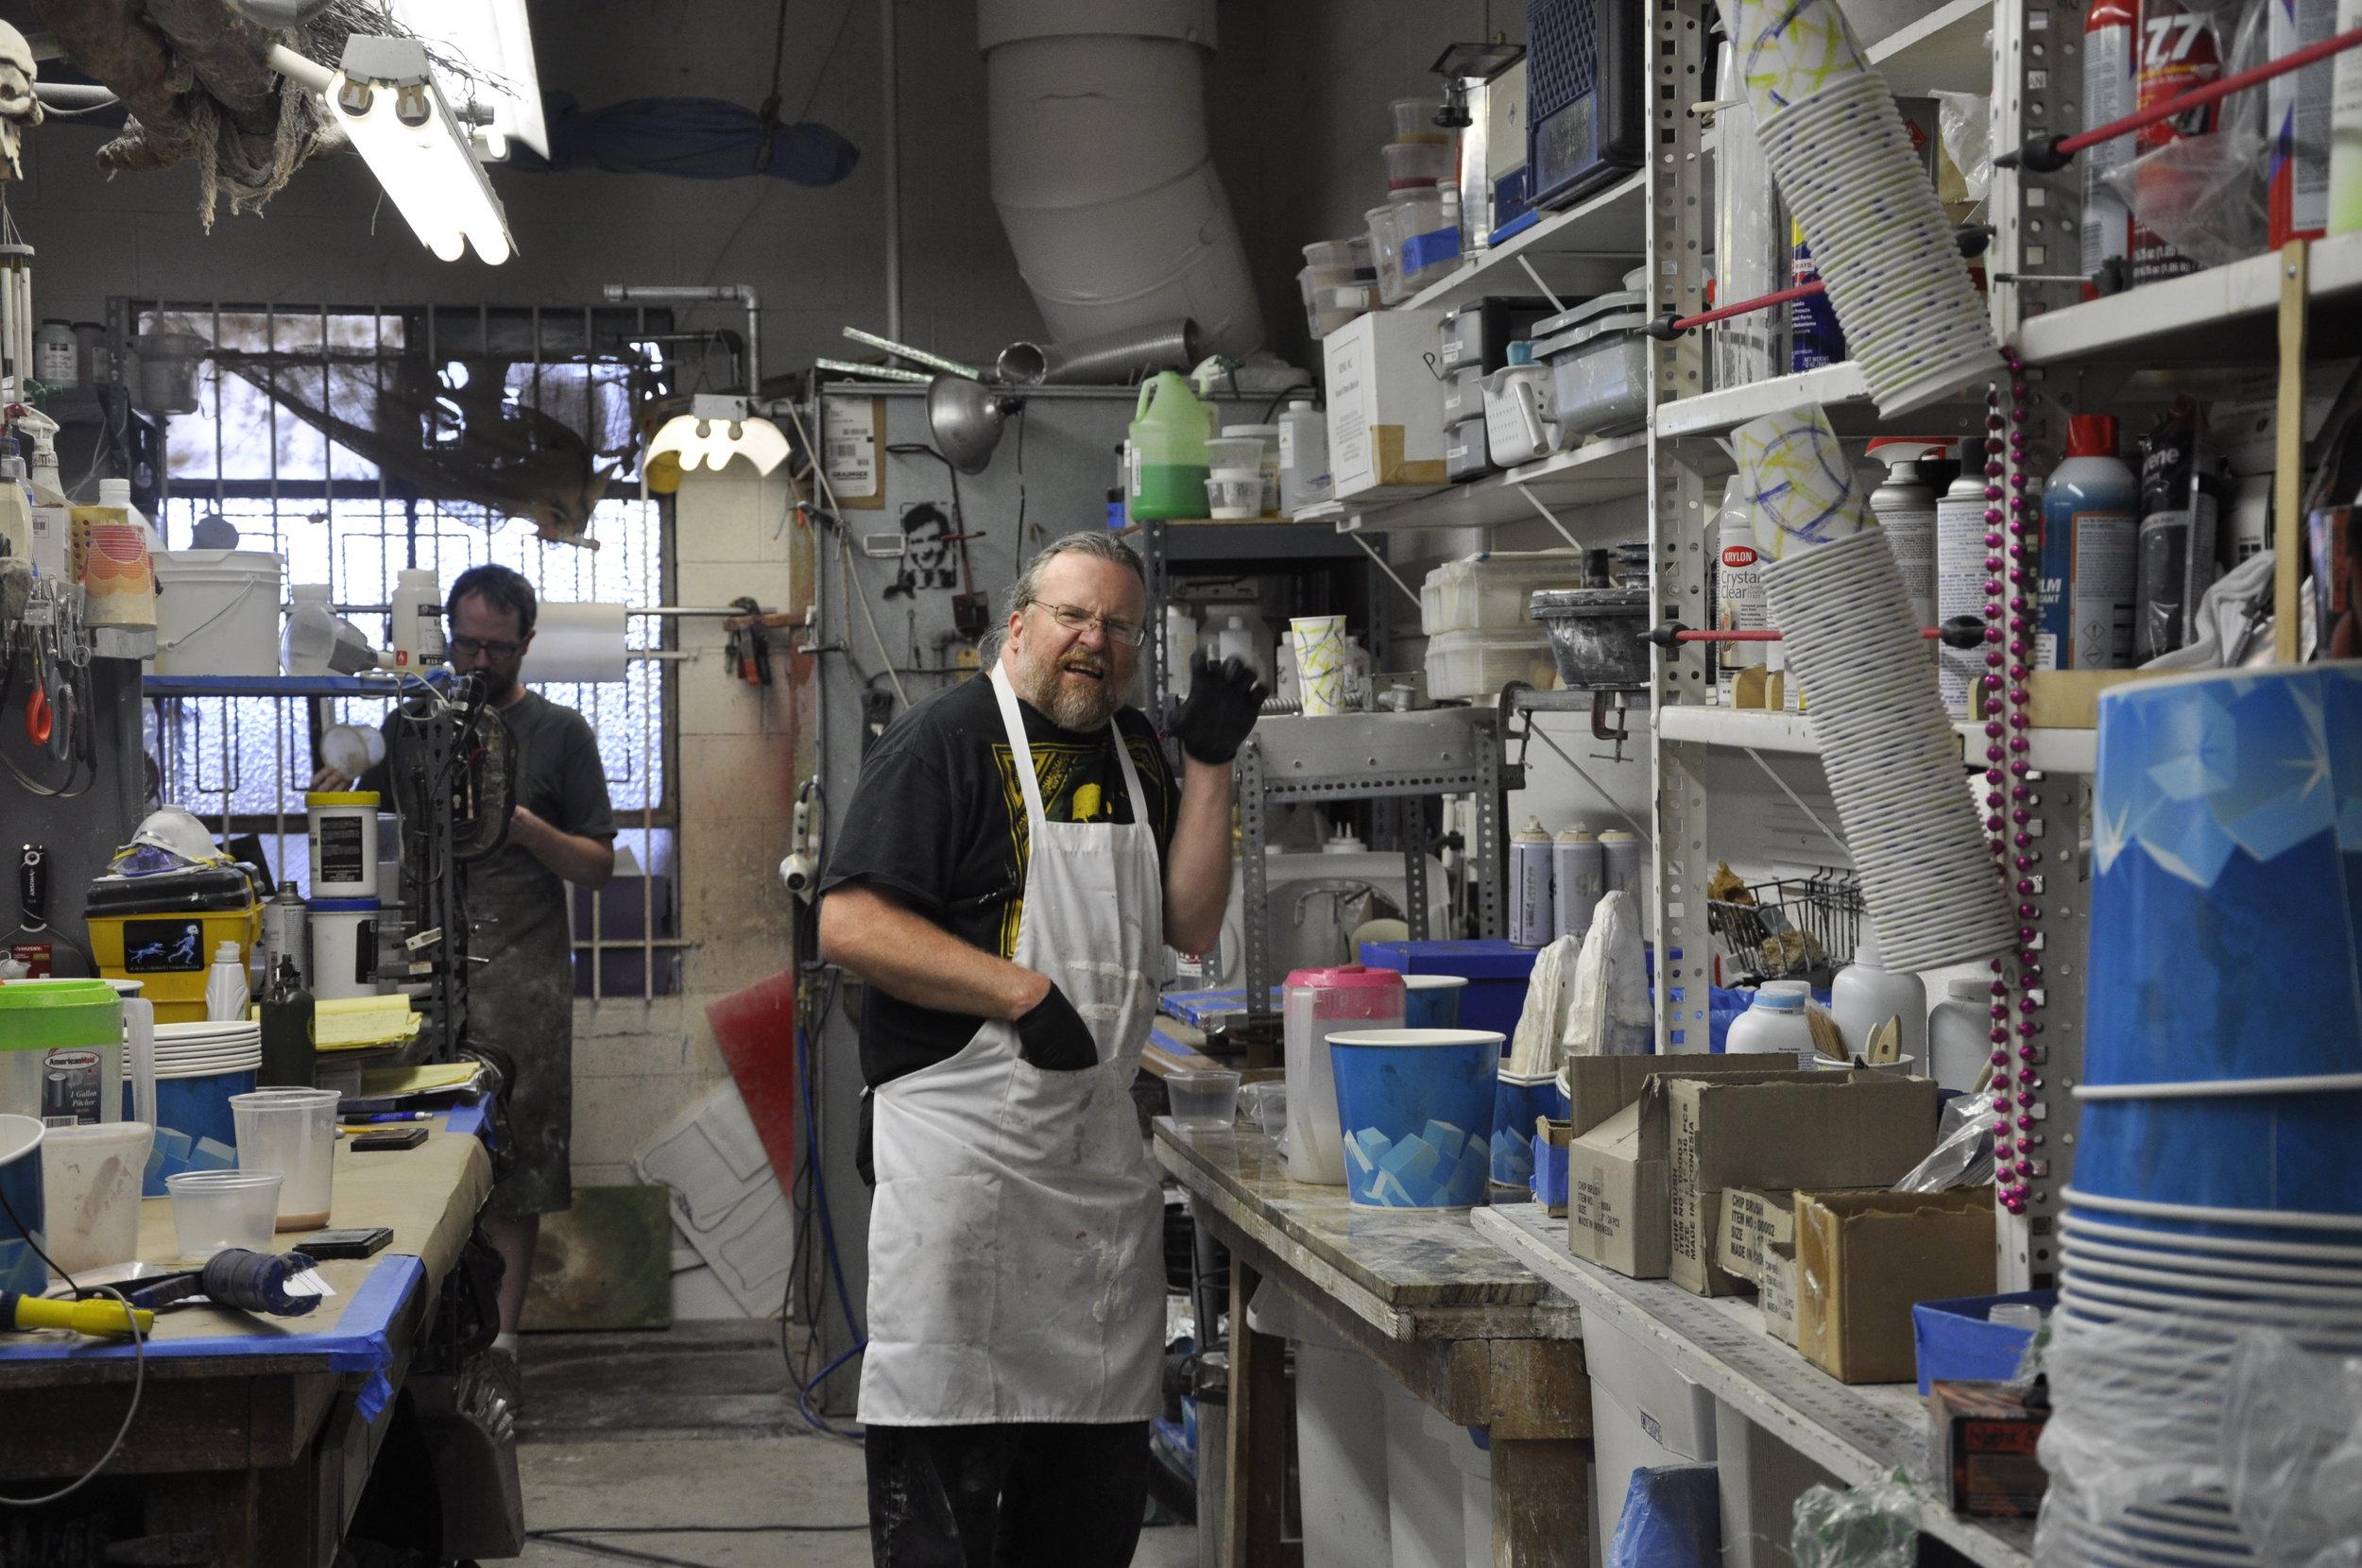 Jim McLaughlin and brad palmer at work